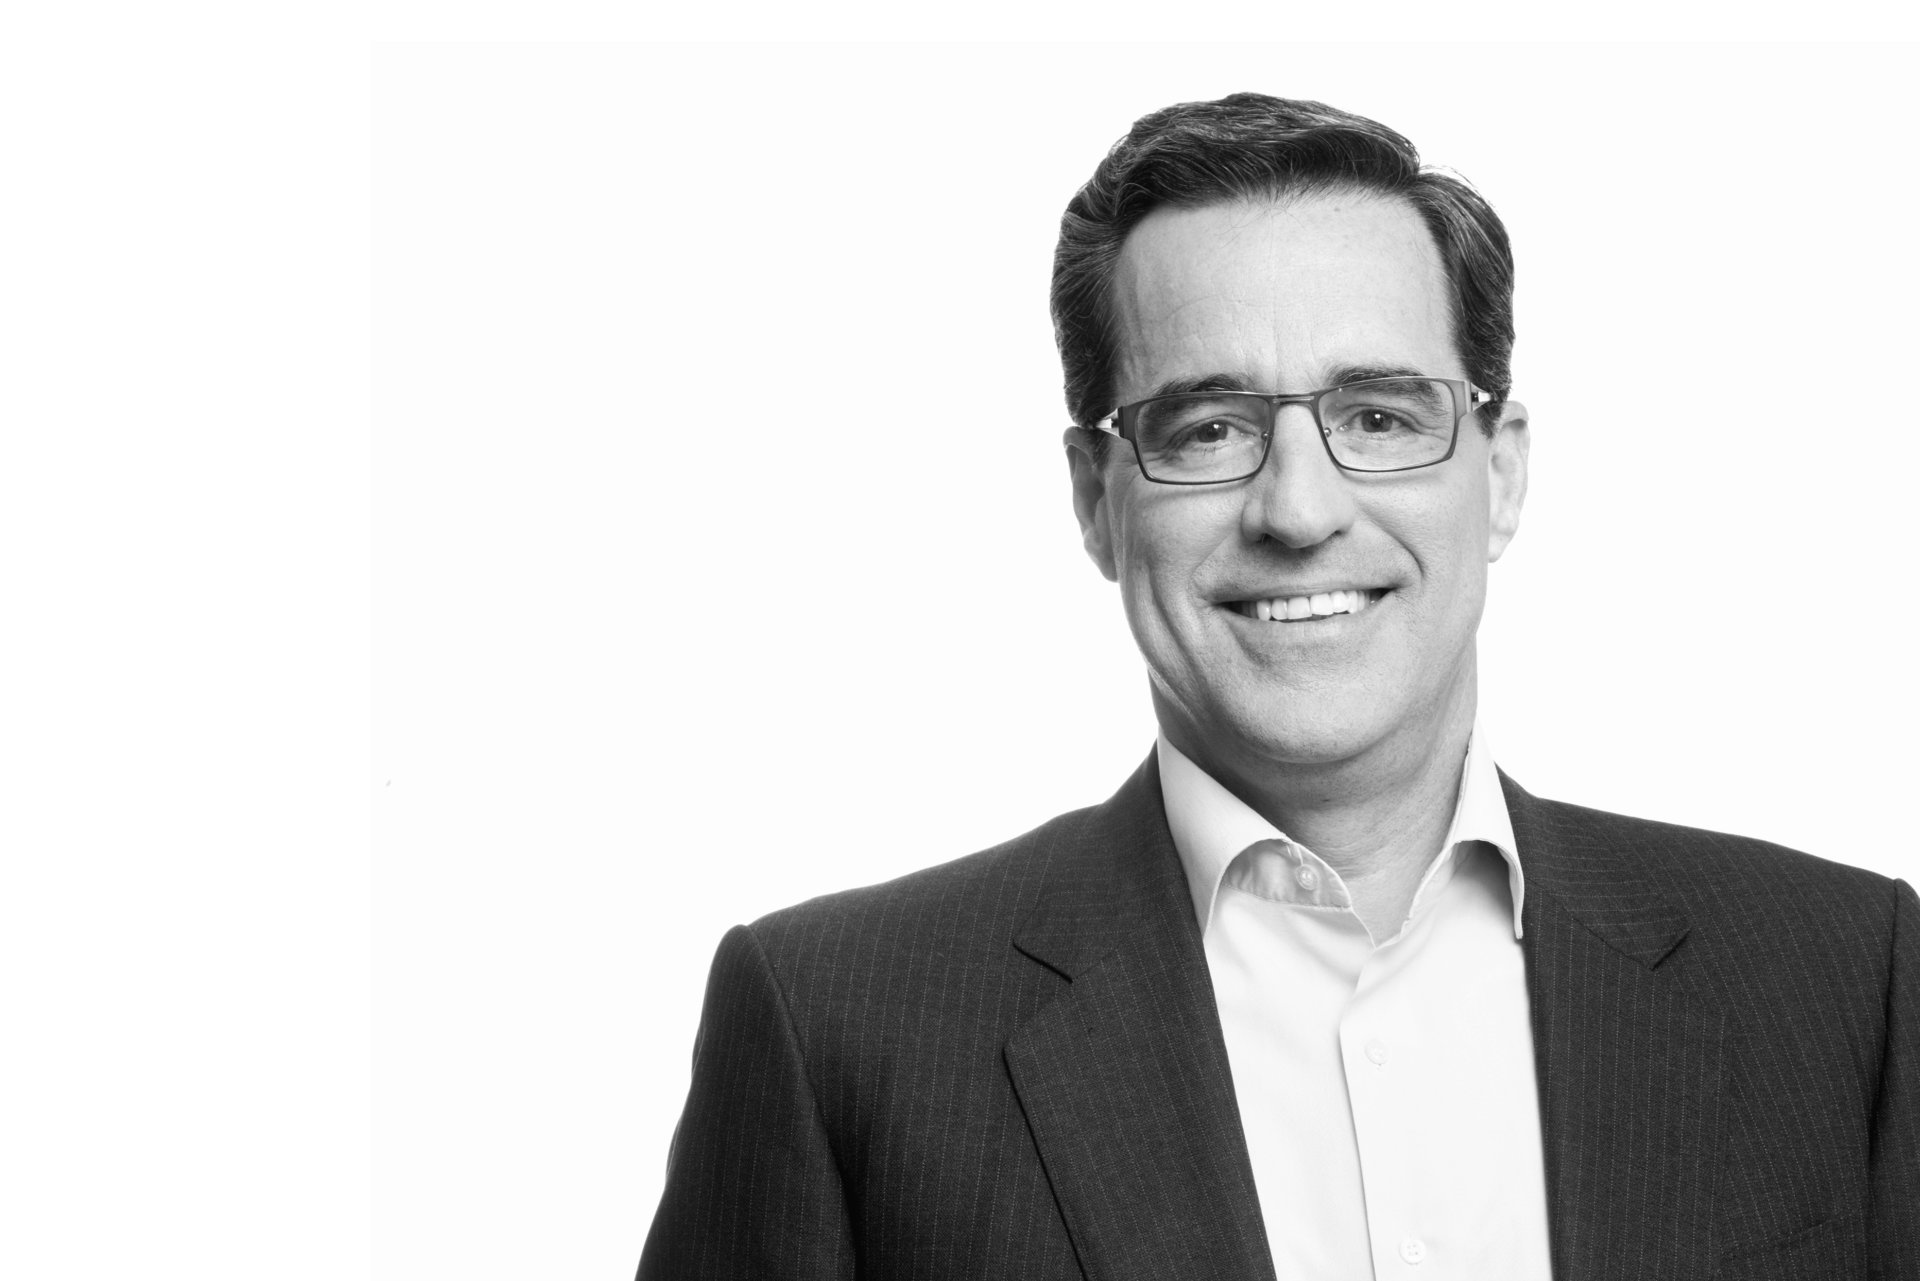 https://shareholdersandinvestors.bbva.com/wp-content/uploads/2017/06/Jaime-Saenz-de-Tejada-BBVA-1.jpg